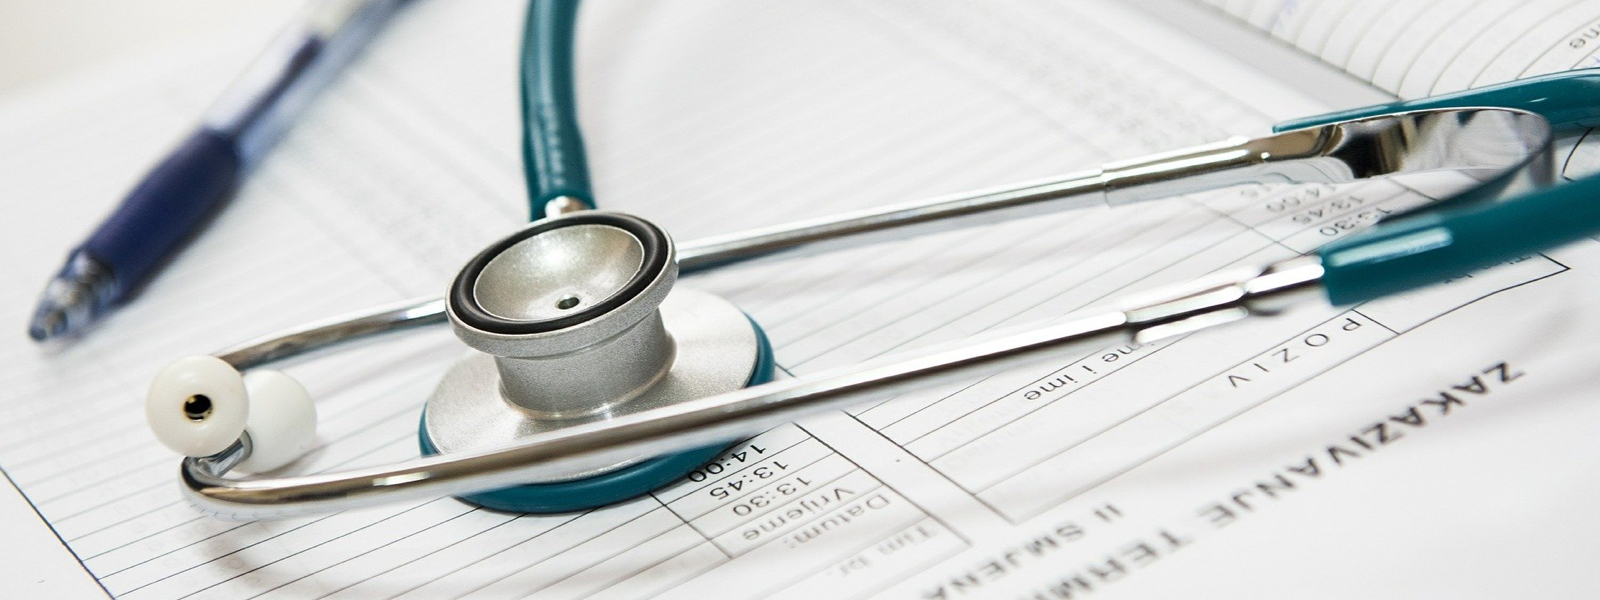 stethoscope on piece of paper new grad nursing credentials